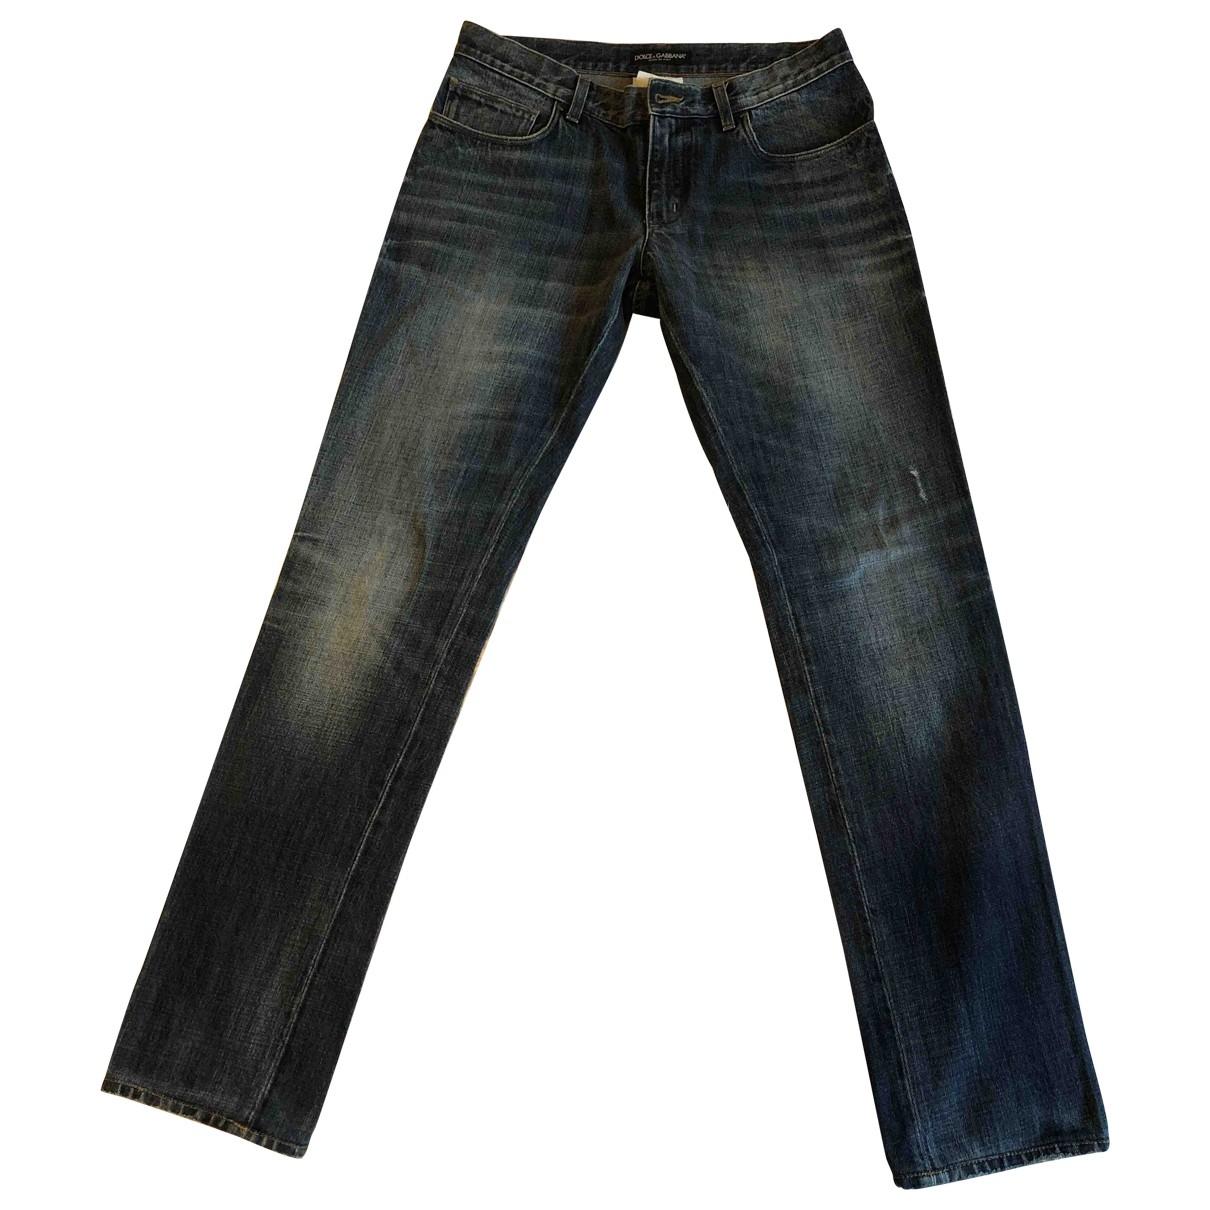 Dolce & Gabbana \N Blue Cotton Jeans for Men 40 FR